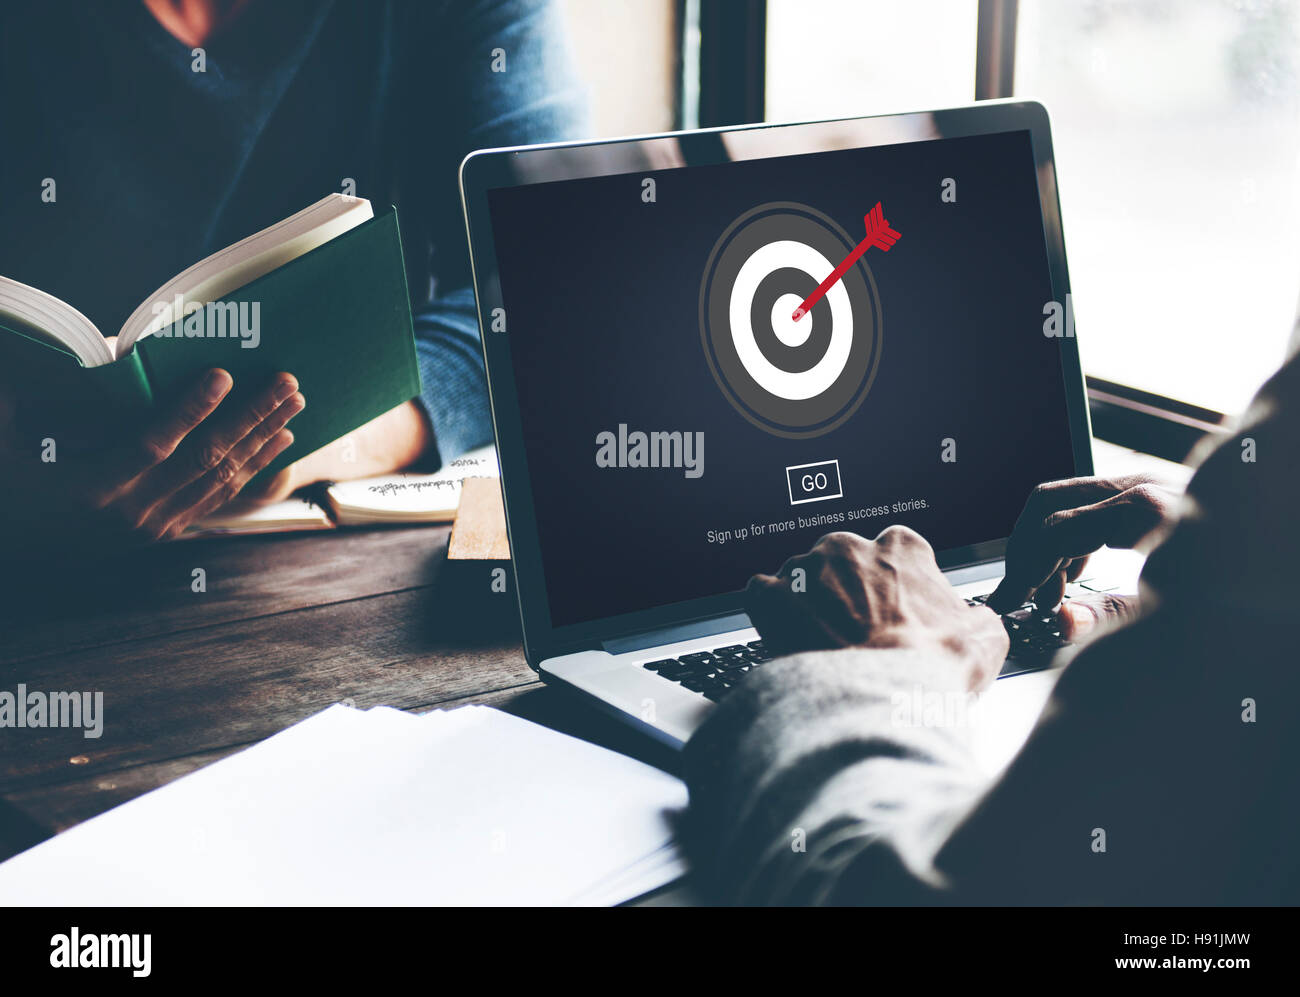 Ausrichtung mit dem Ziel Shhot direktional präzise Konzept Stockbild